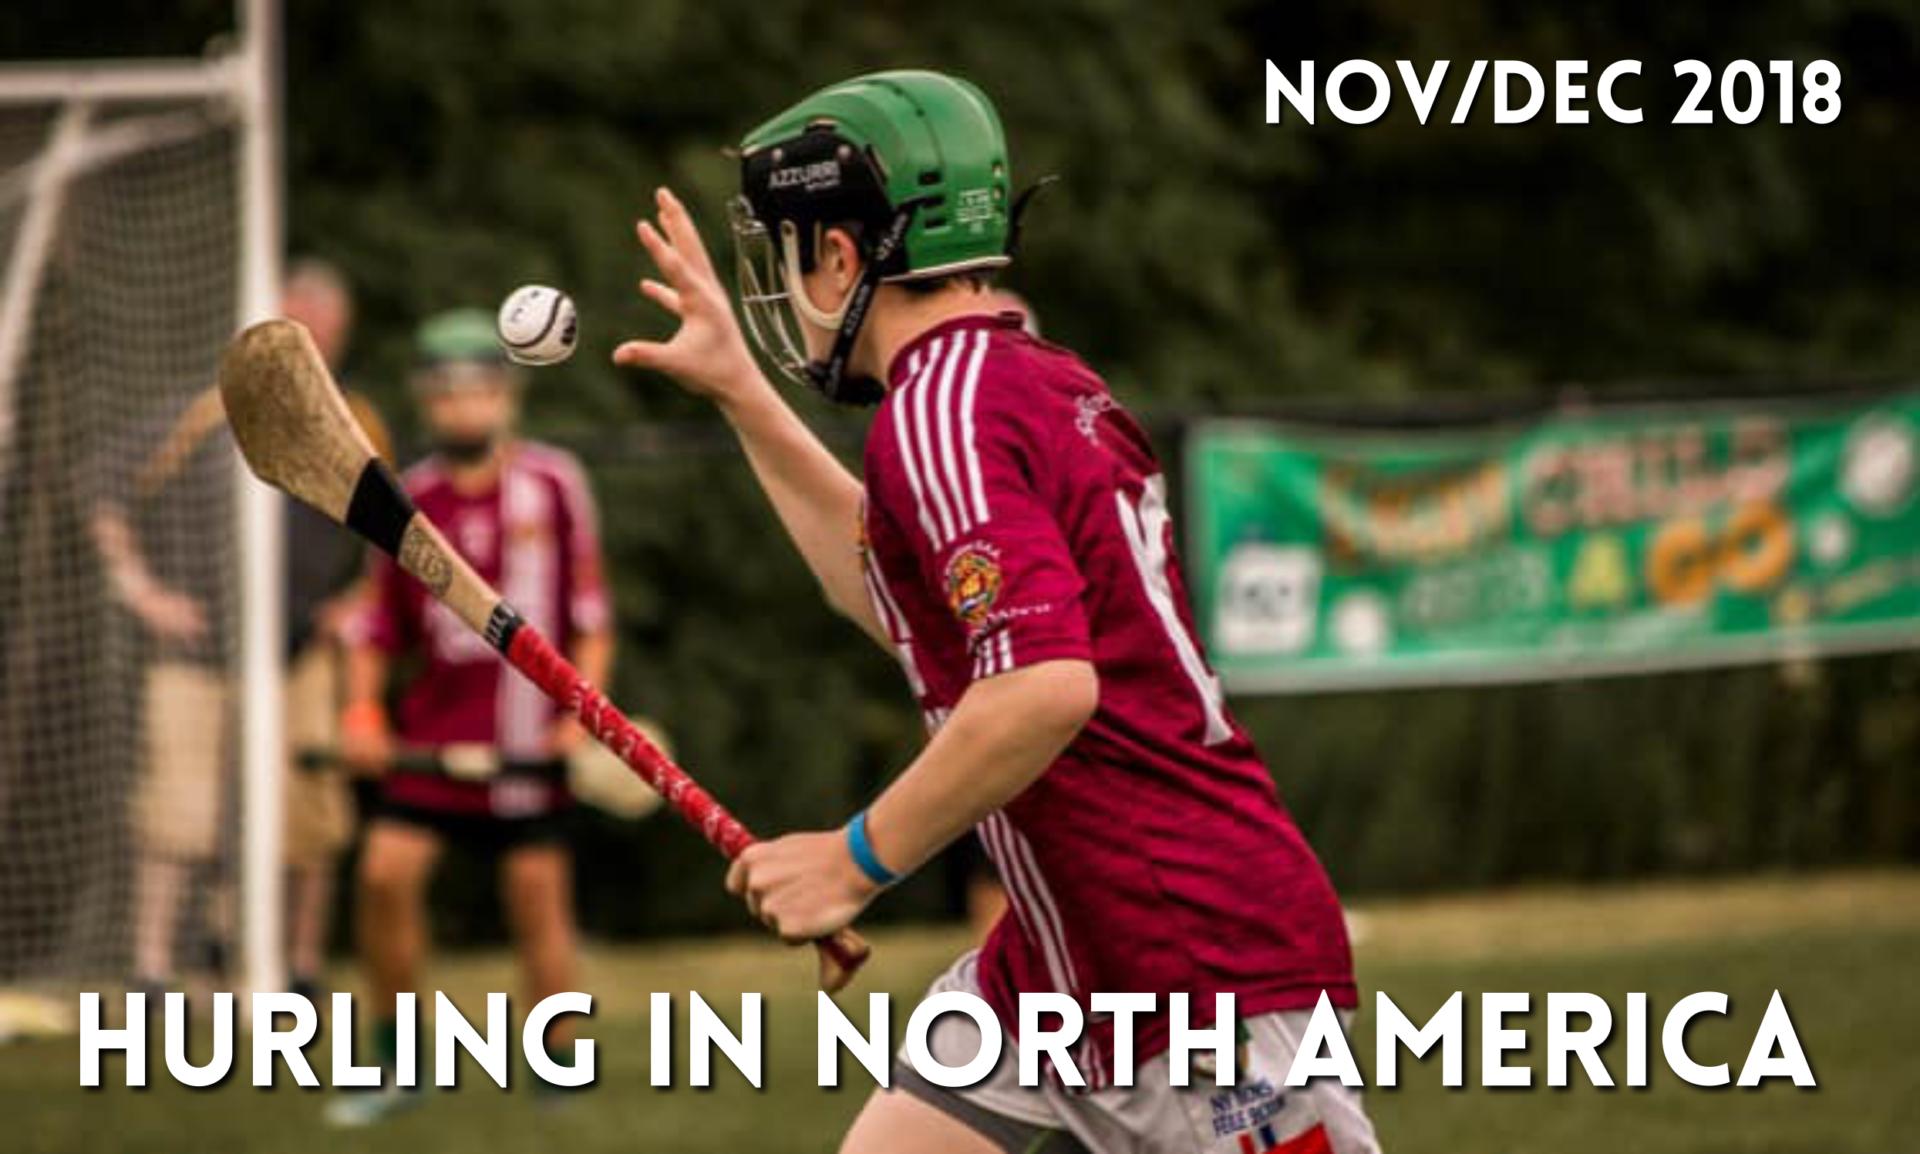 Hurling in North America News | November & December 2018